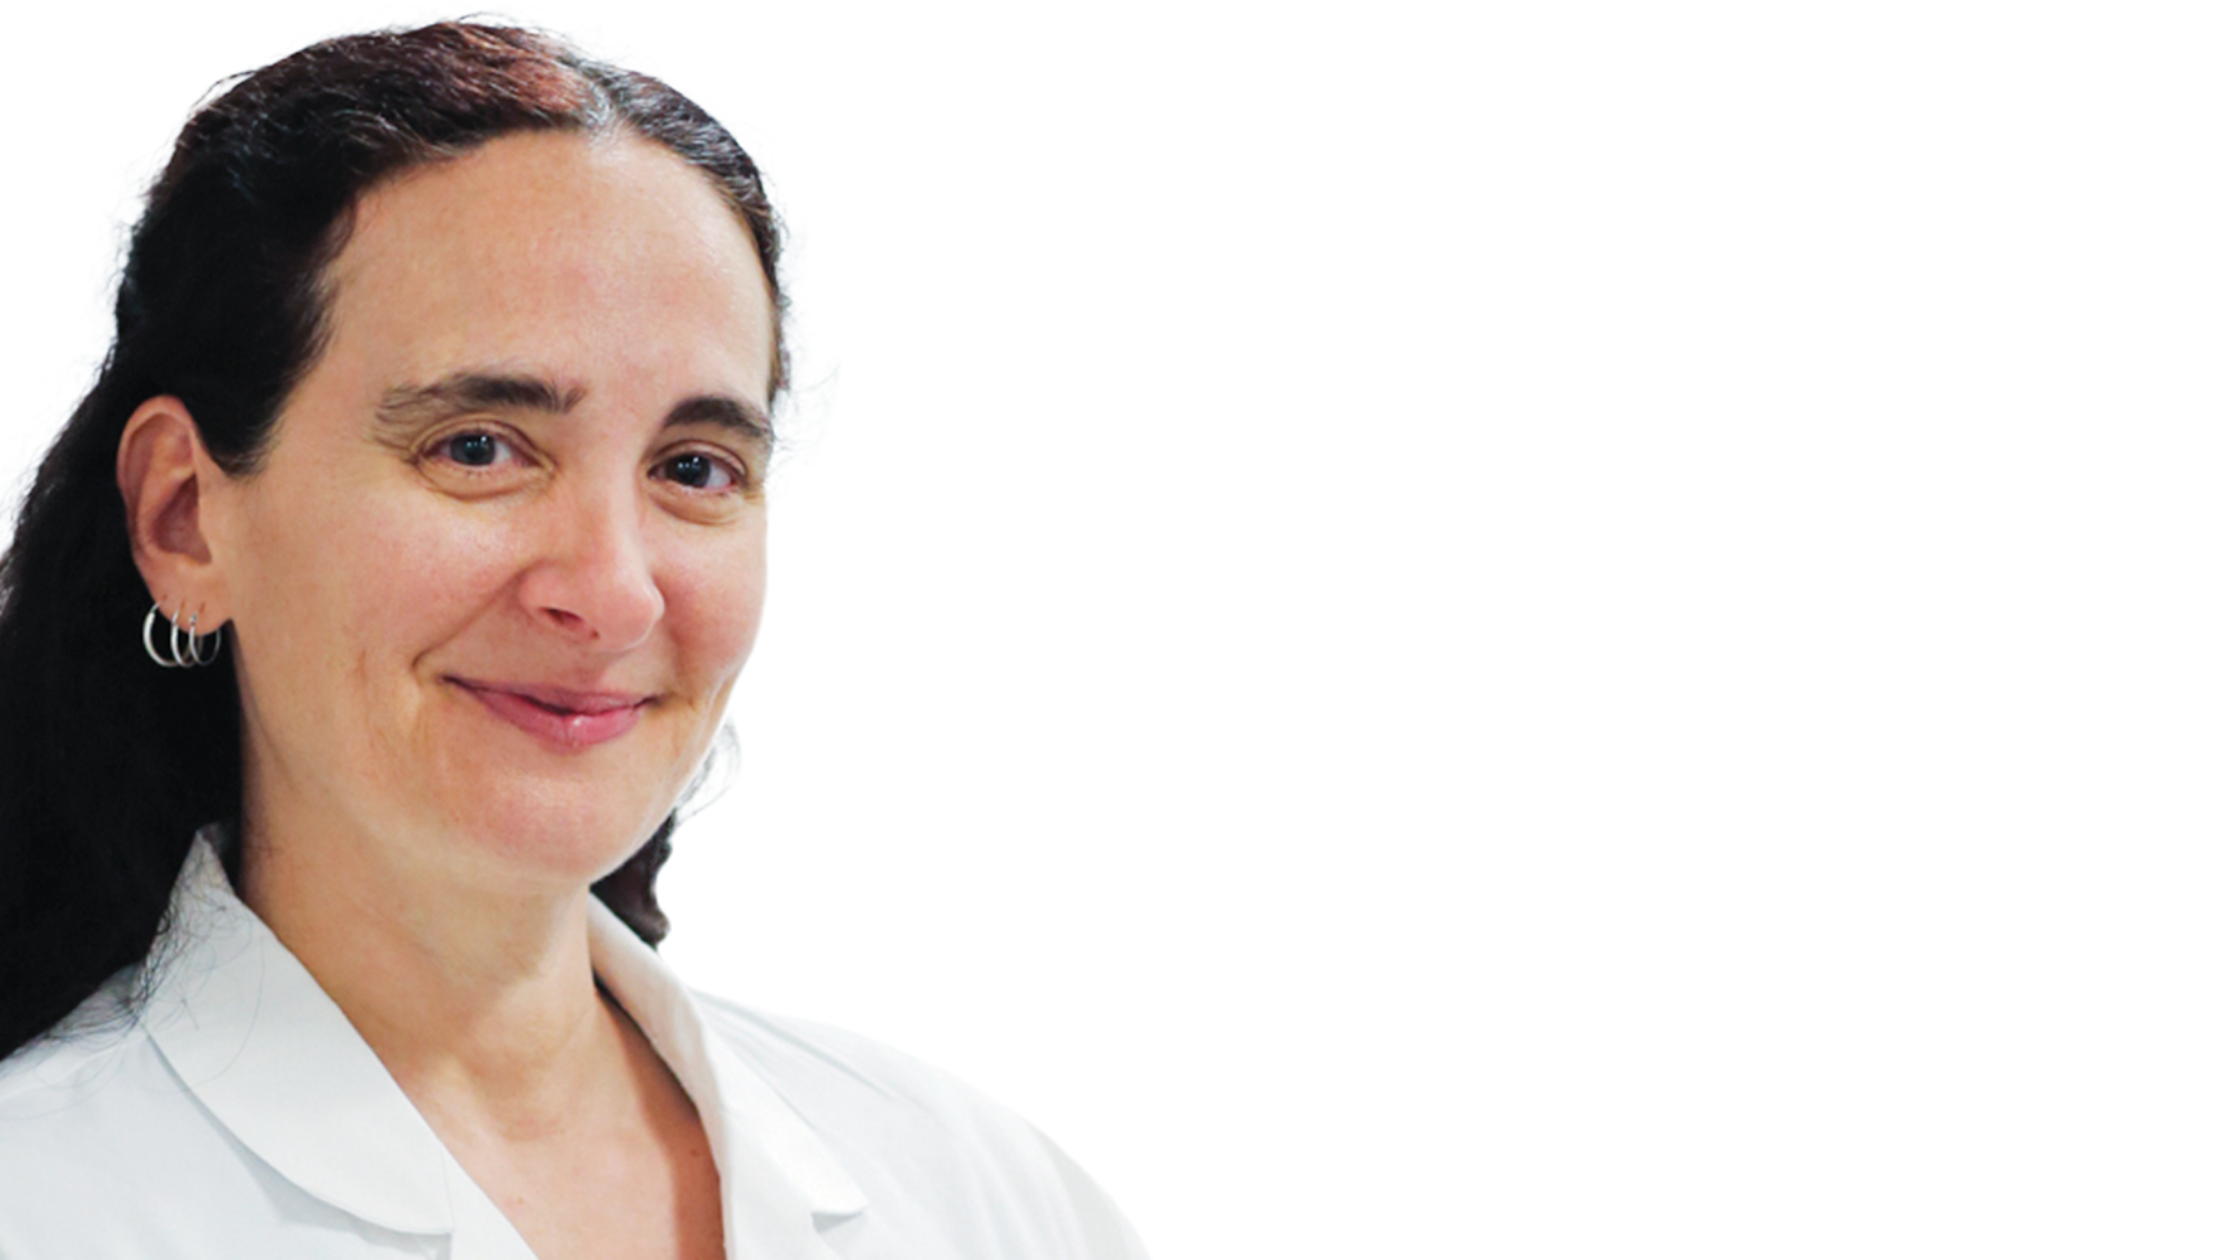 Dr. Tara Aghaloo - Osstell ISQ Symposium